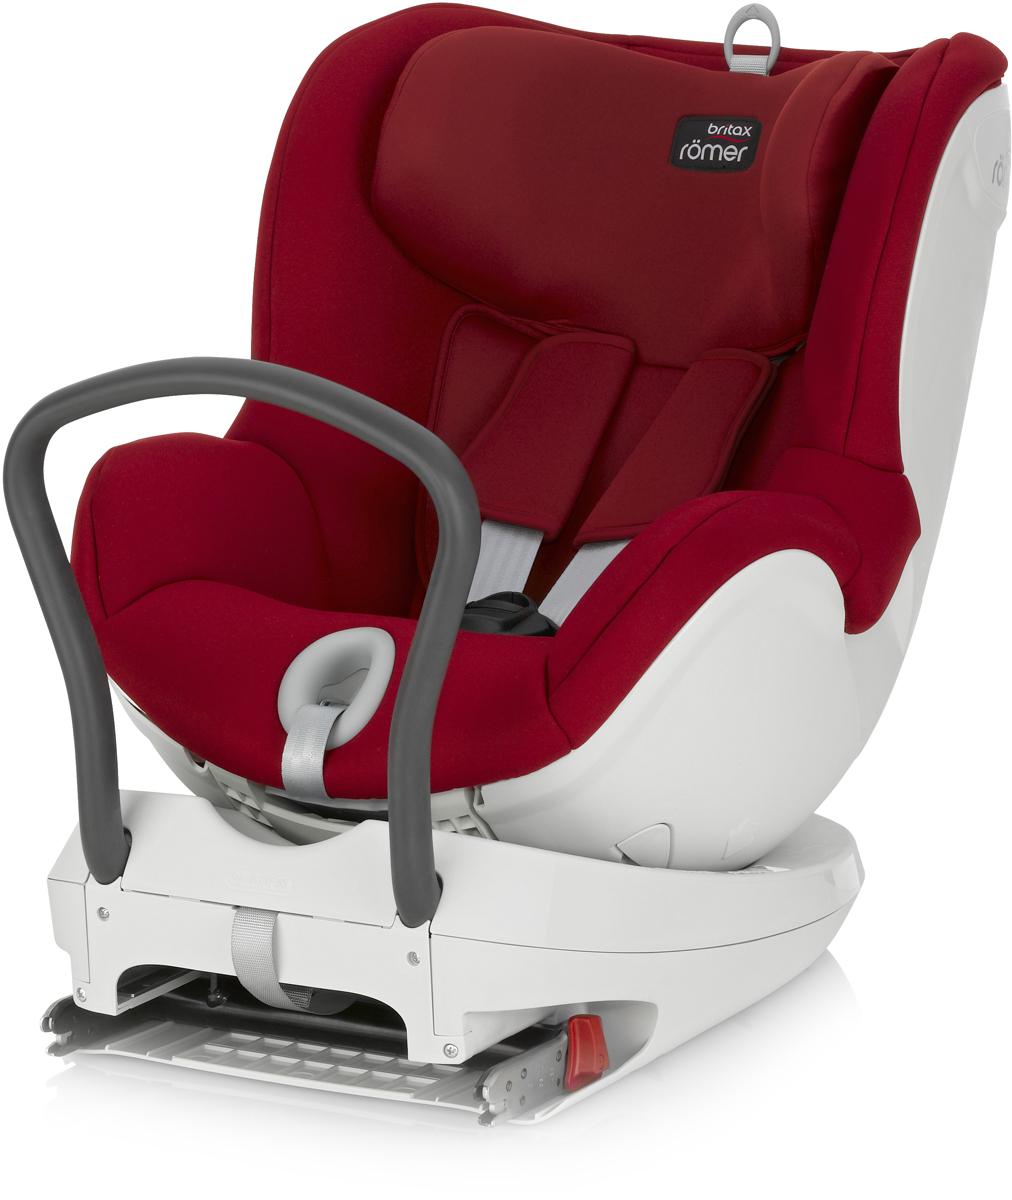 Romer Автокресло Dualfix Flame Red до 18 кг -  Автокресла и аксессуары